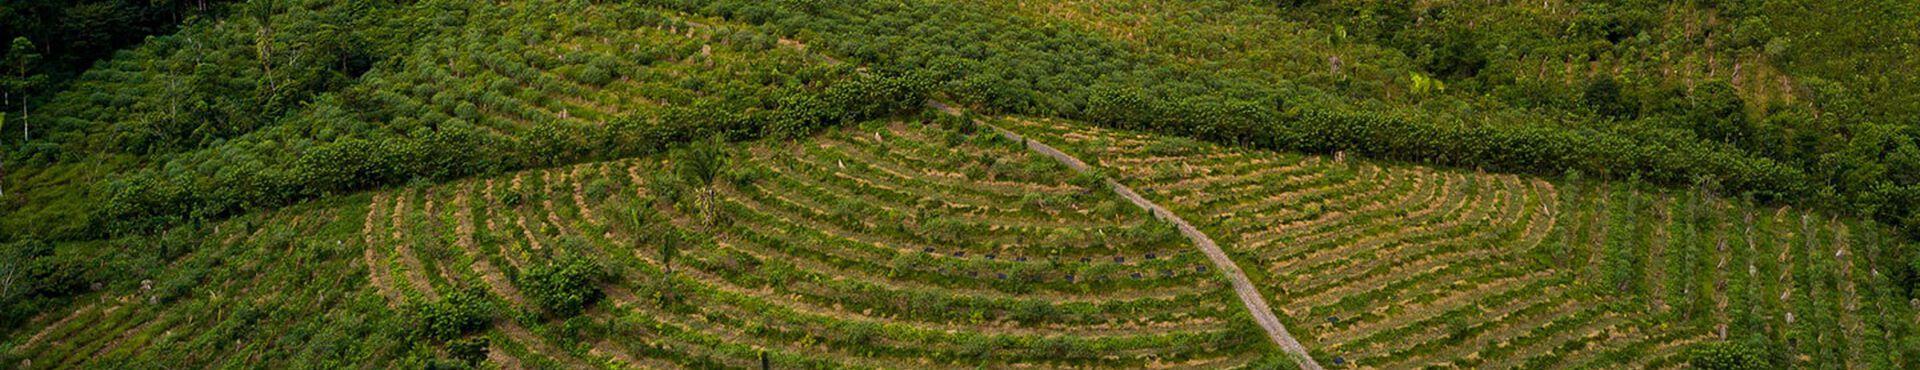 Banner - What is Regenerative Farming?